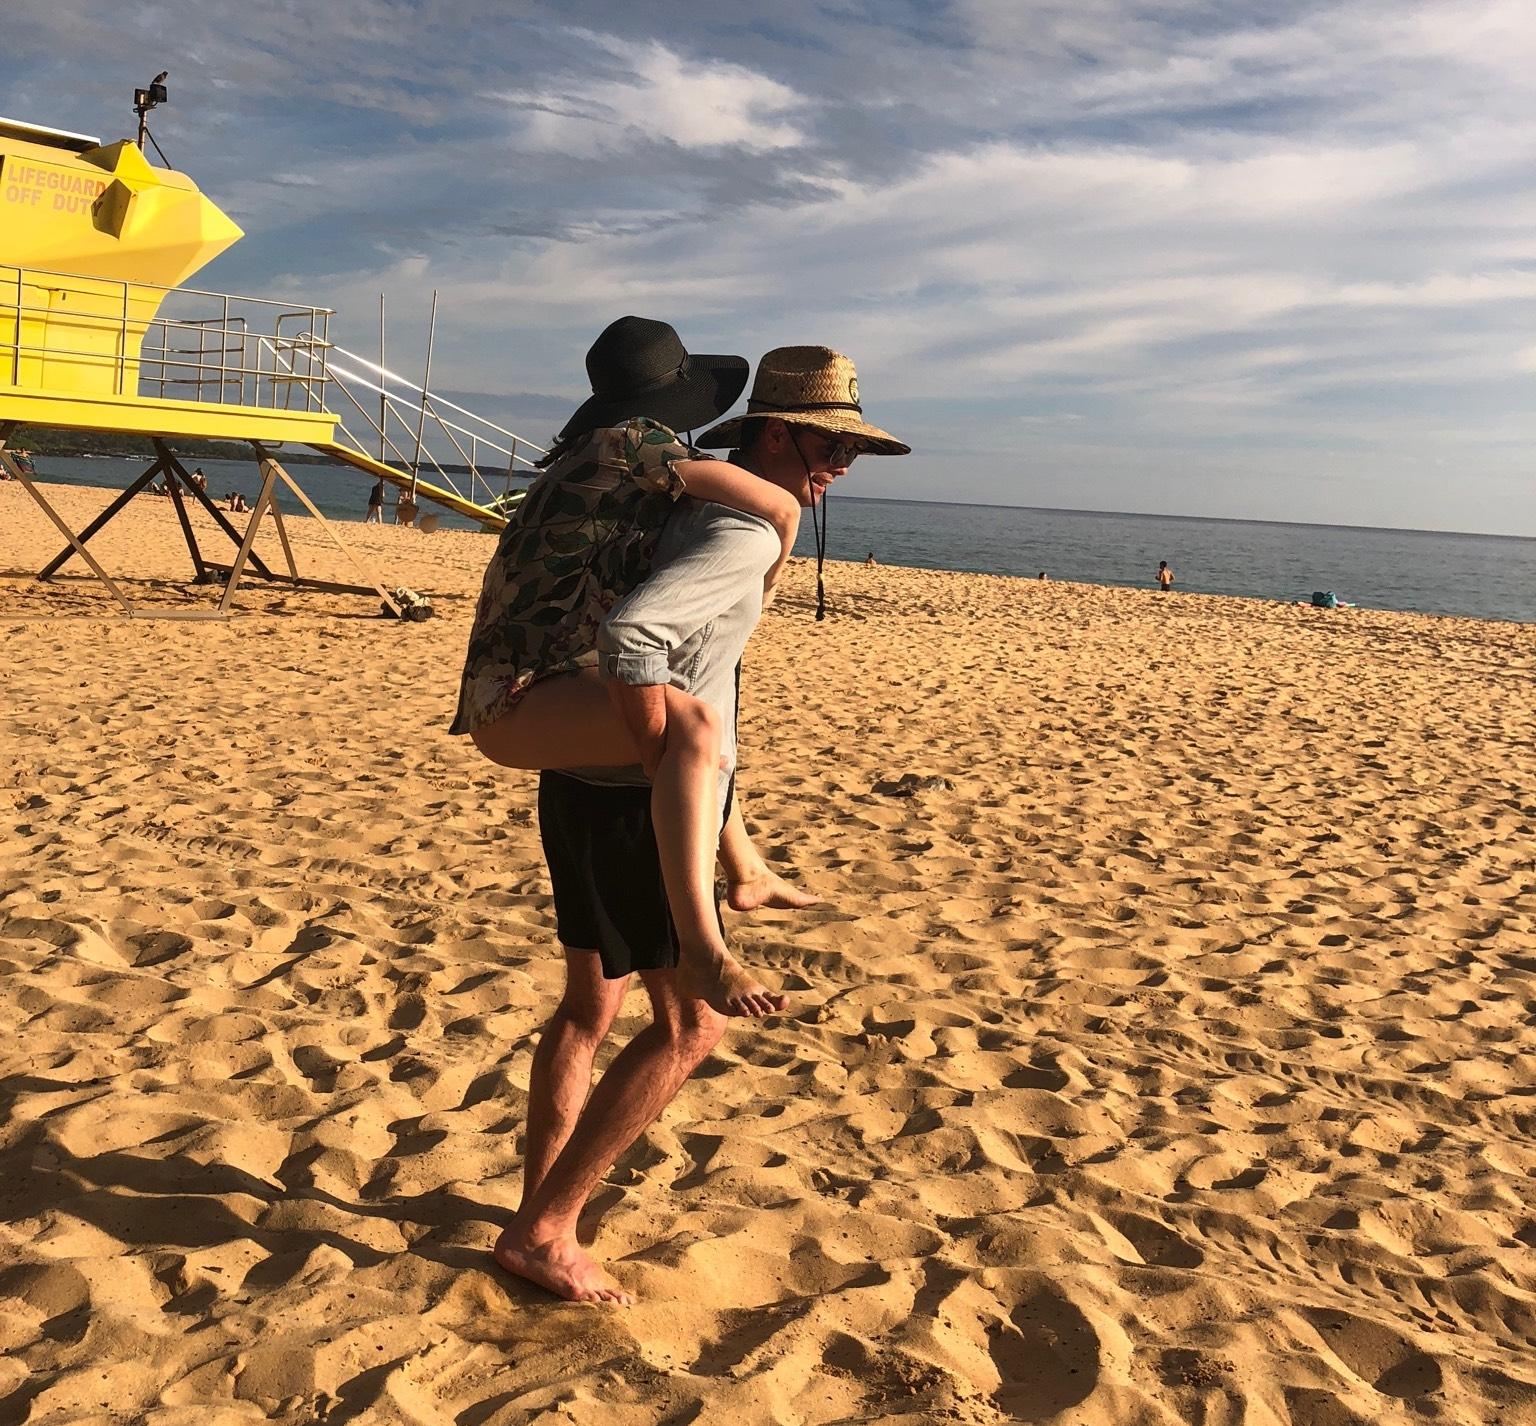 hawaii destination wedding ideas 2018